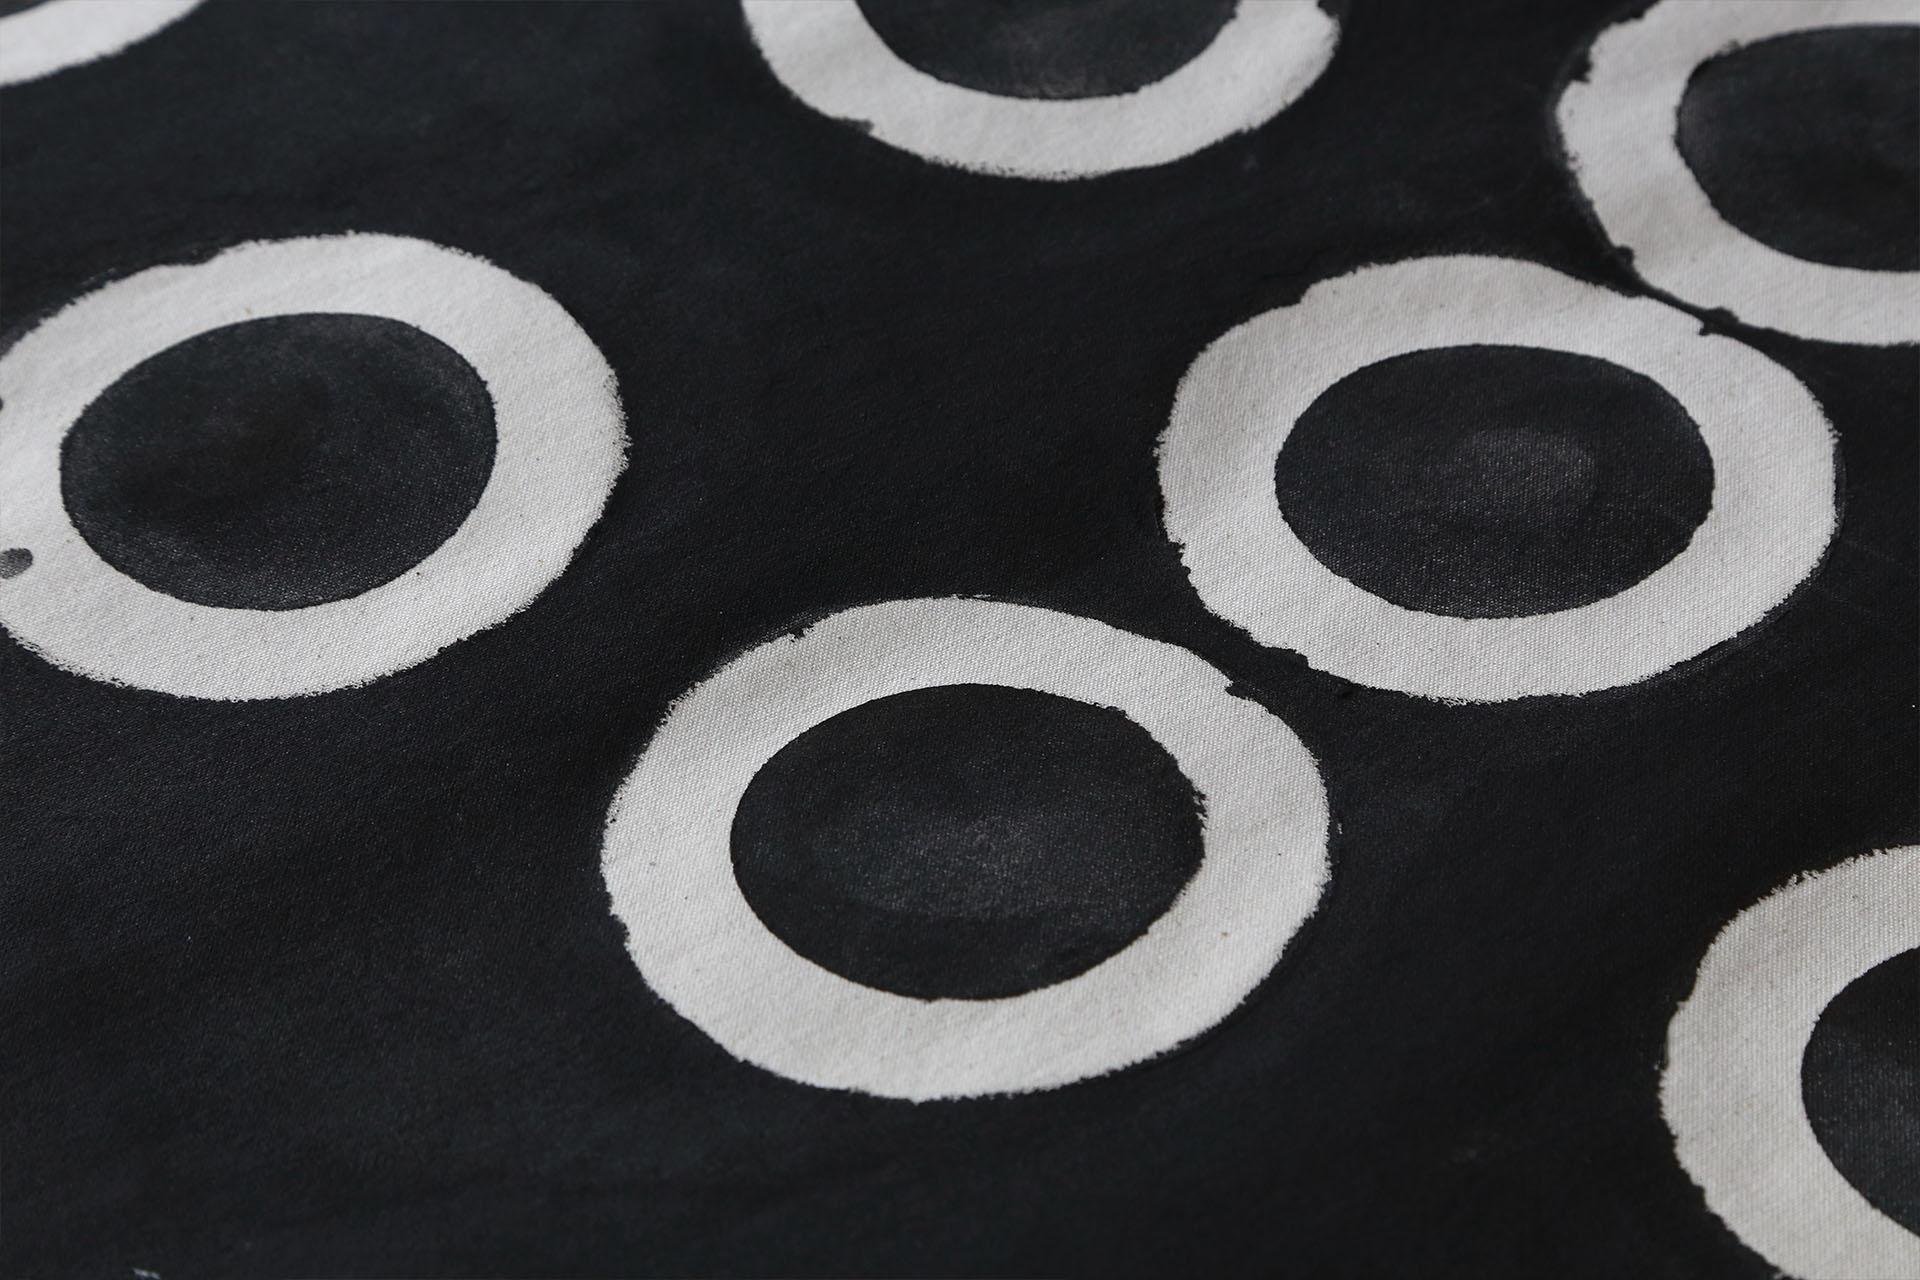 Daniel Silva exhibition at apéro- アペロ ワインバー / オーガニックワインxフランス家庭料理 - 東京都港区南青山3-4-6 / apéro WINEBAR - vins et petits plats français - 2016